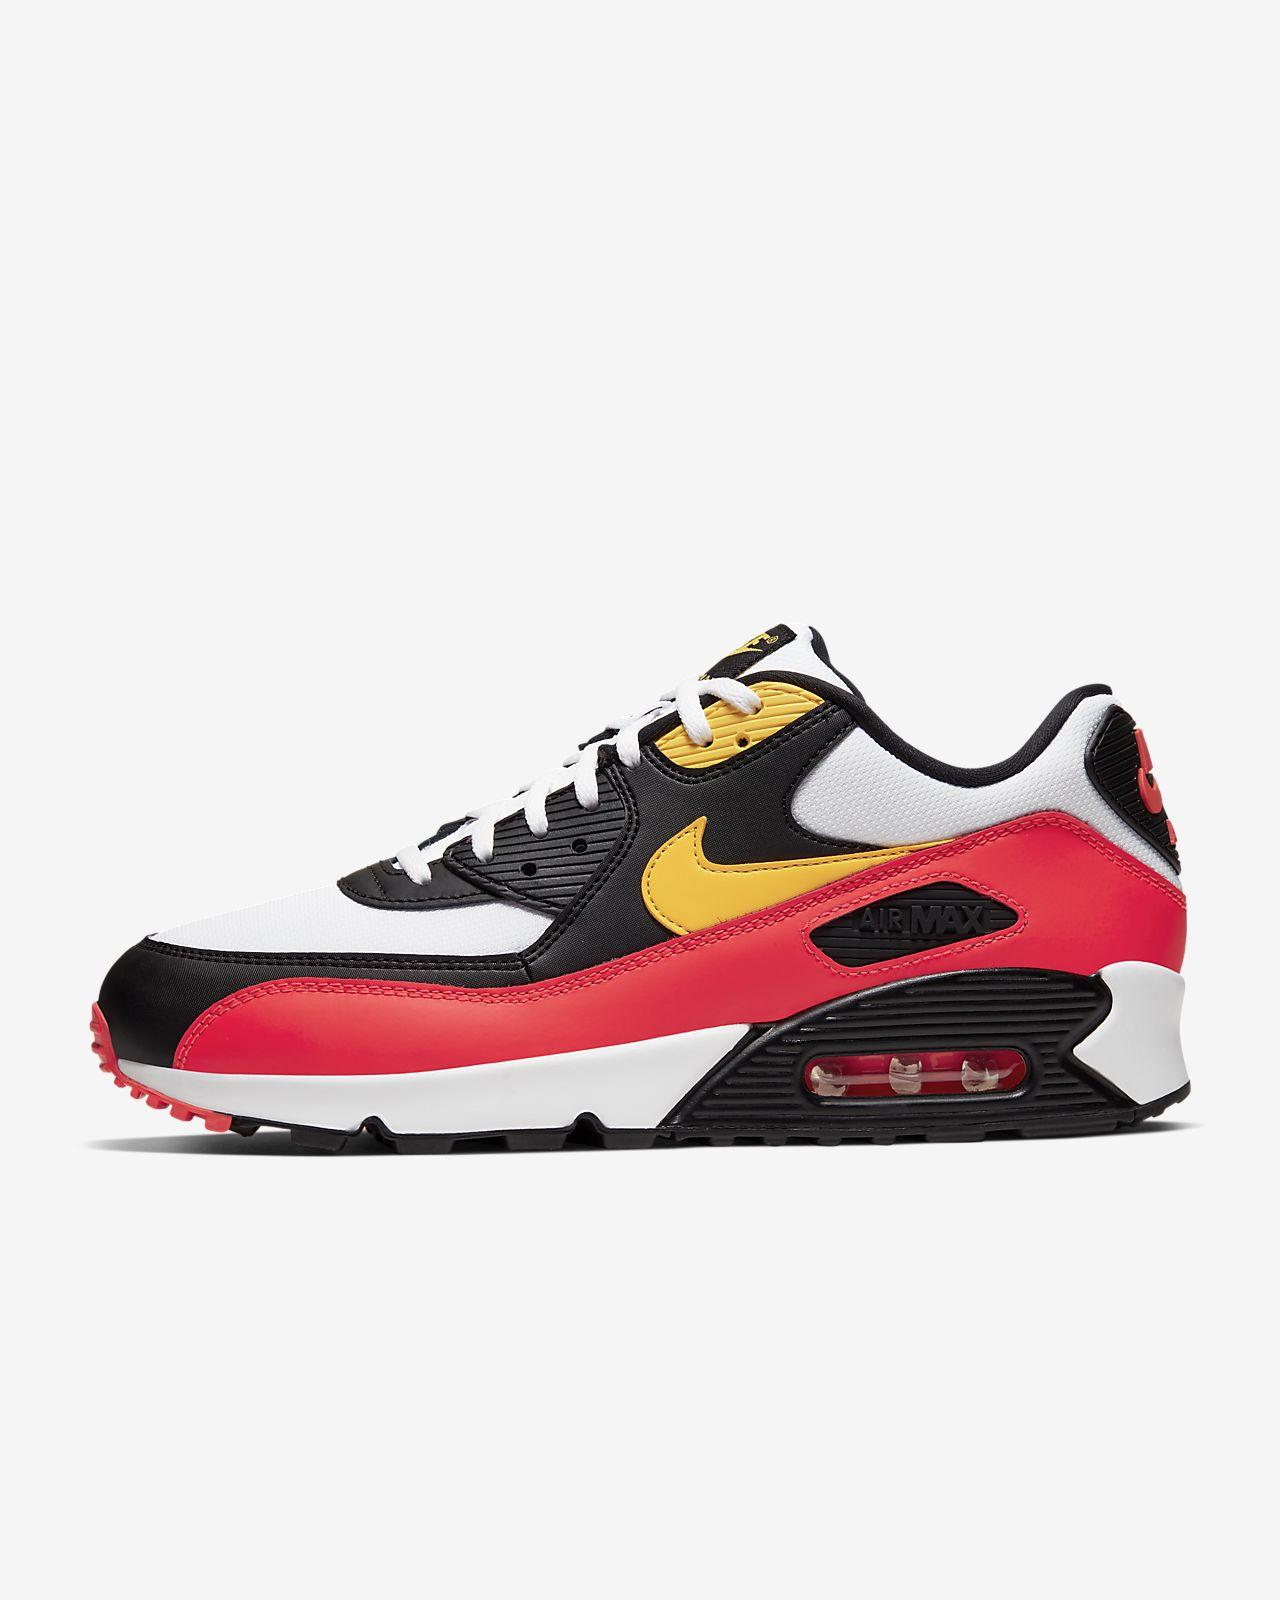 Zapatillas Nike Air Max 1 Premium (blackanthracitered)